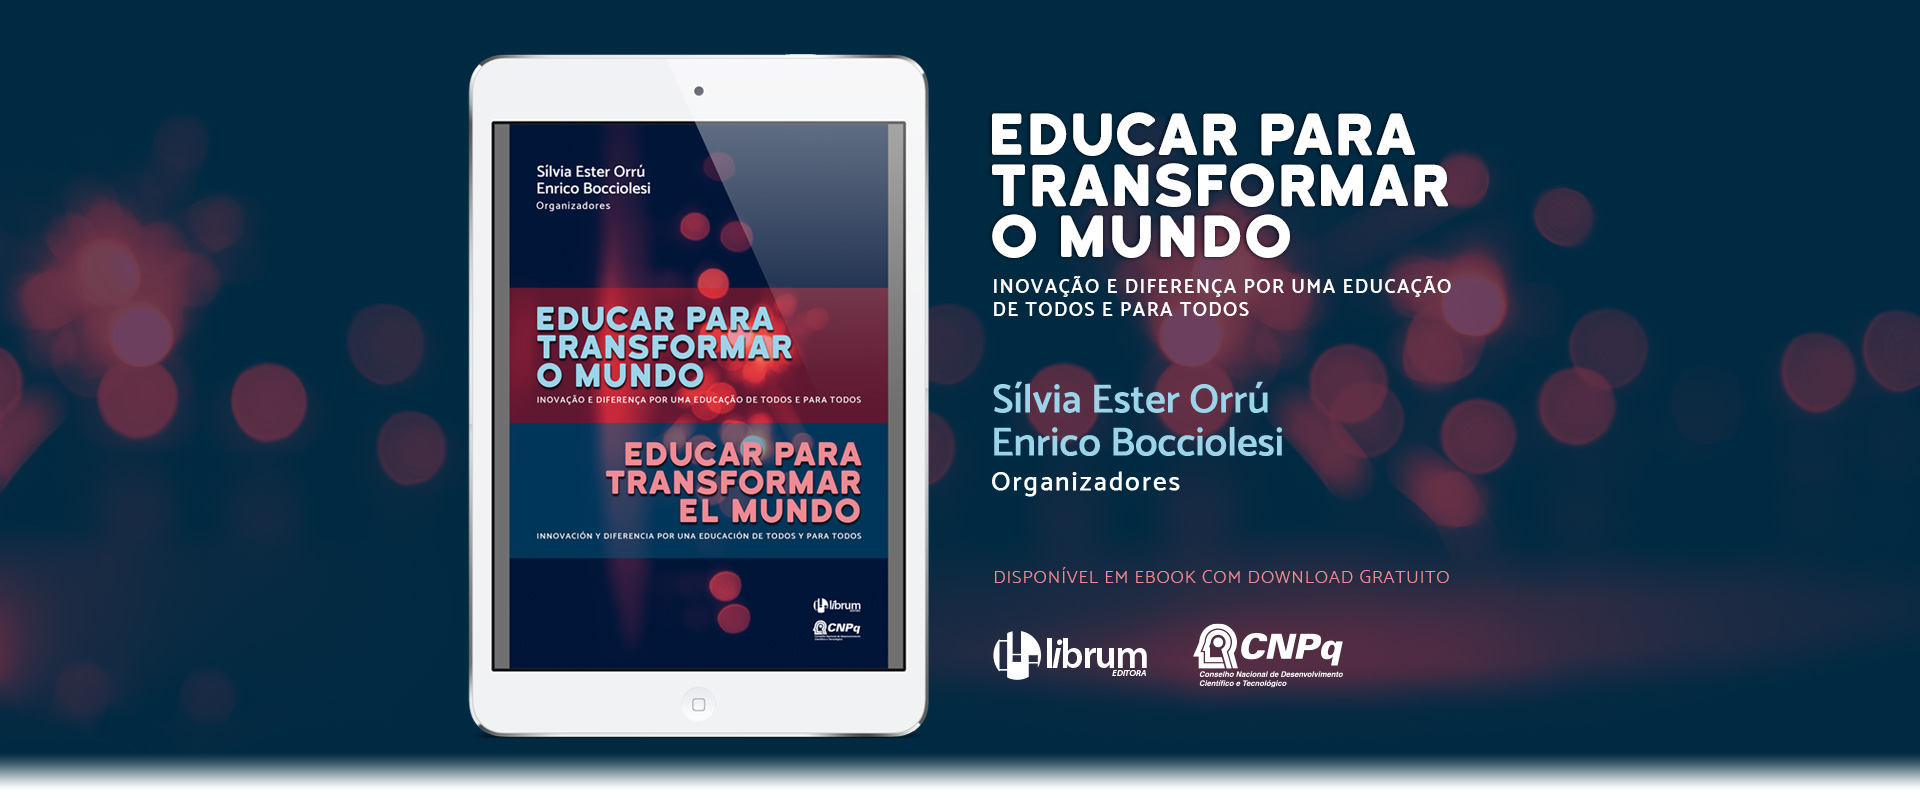 silvia_orru_librum_editora_educar_tranformar_ebook_hd